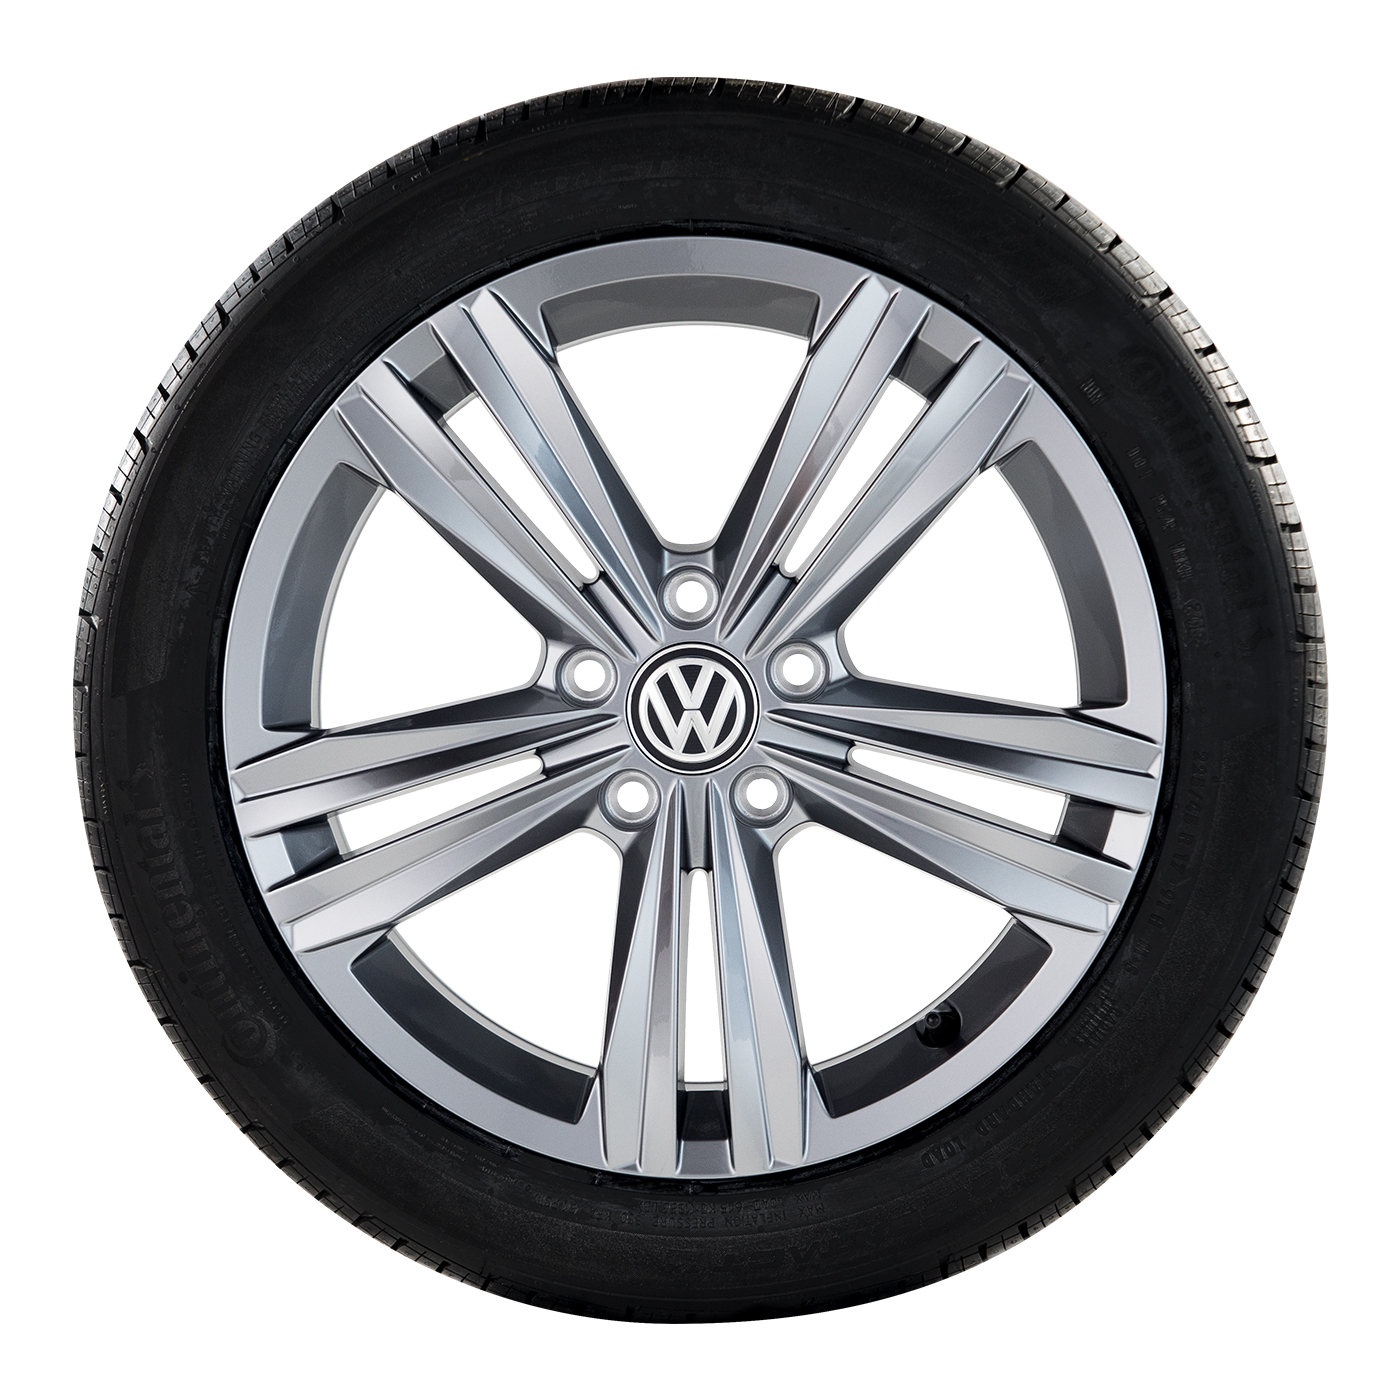 Volkswagen 17 Trenton Wheels | VW Service and Parts